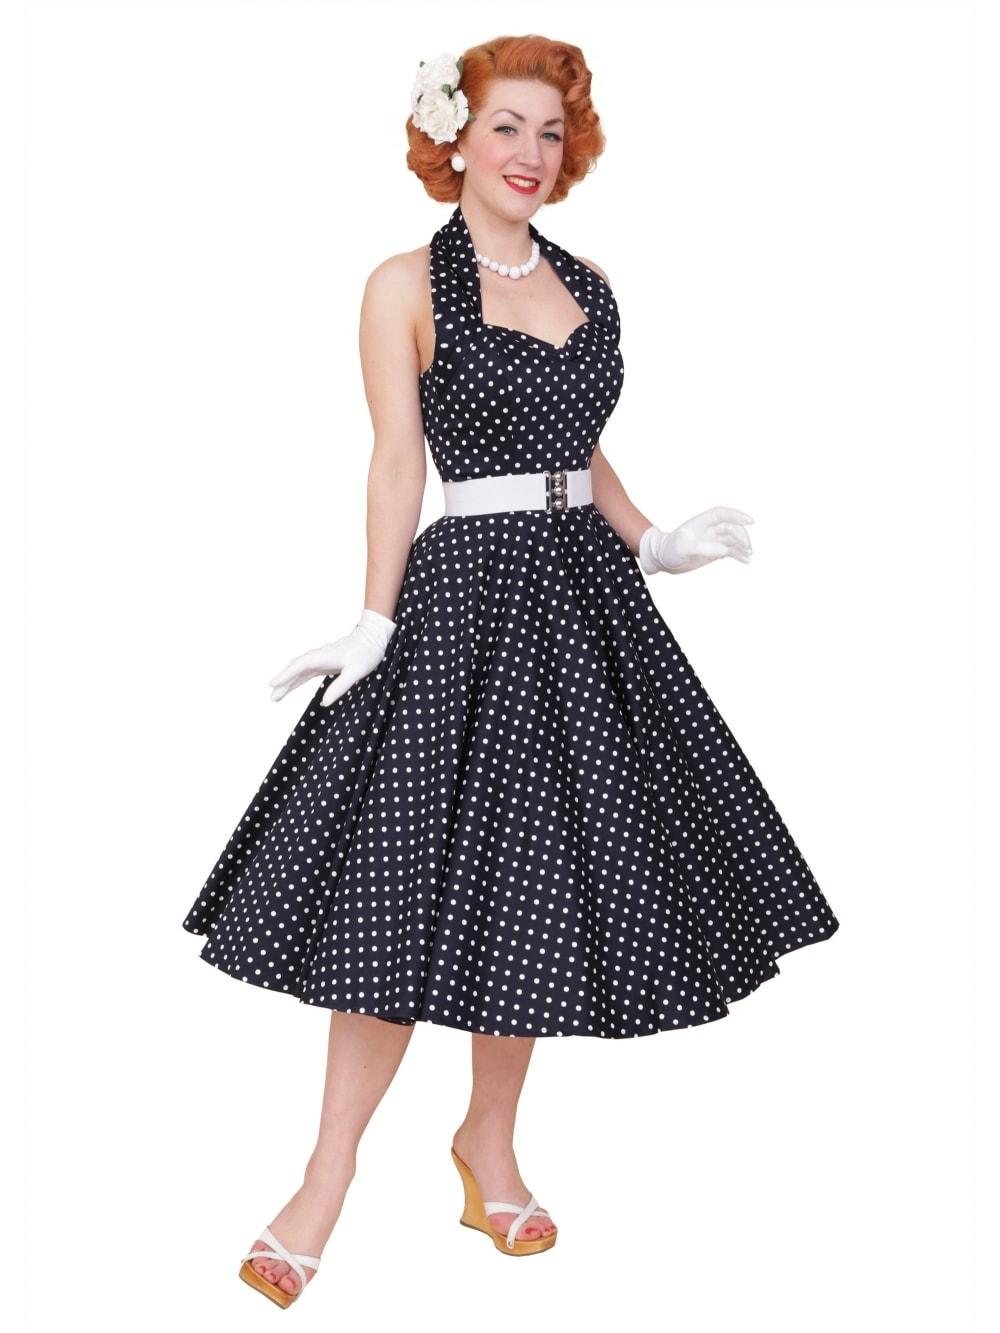 77d7d25cb241 1950s Halterneck Navy White Spot Dress from Vivien of Holloway